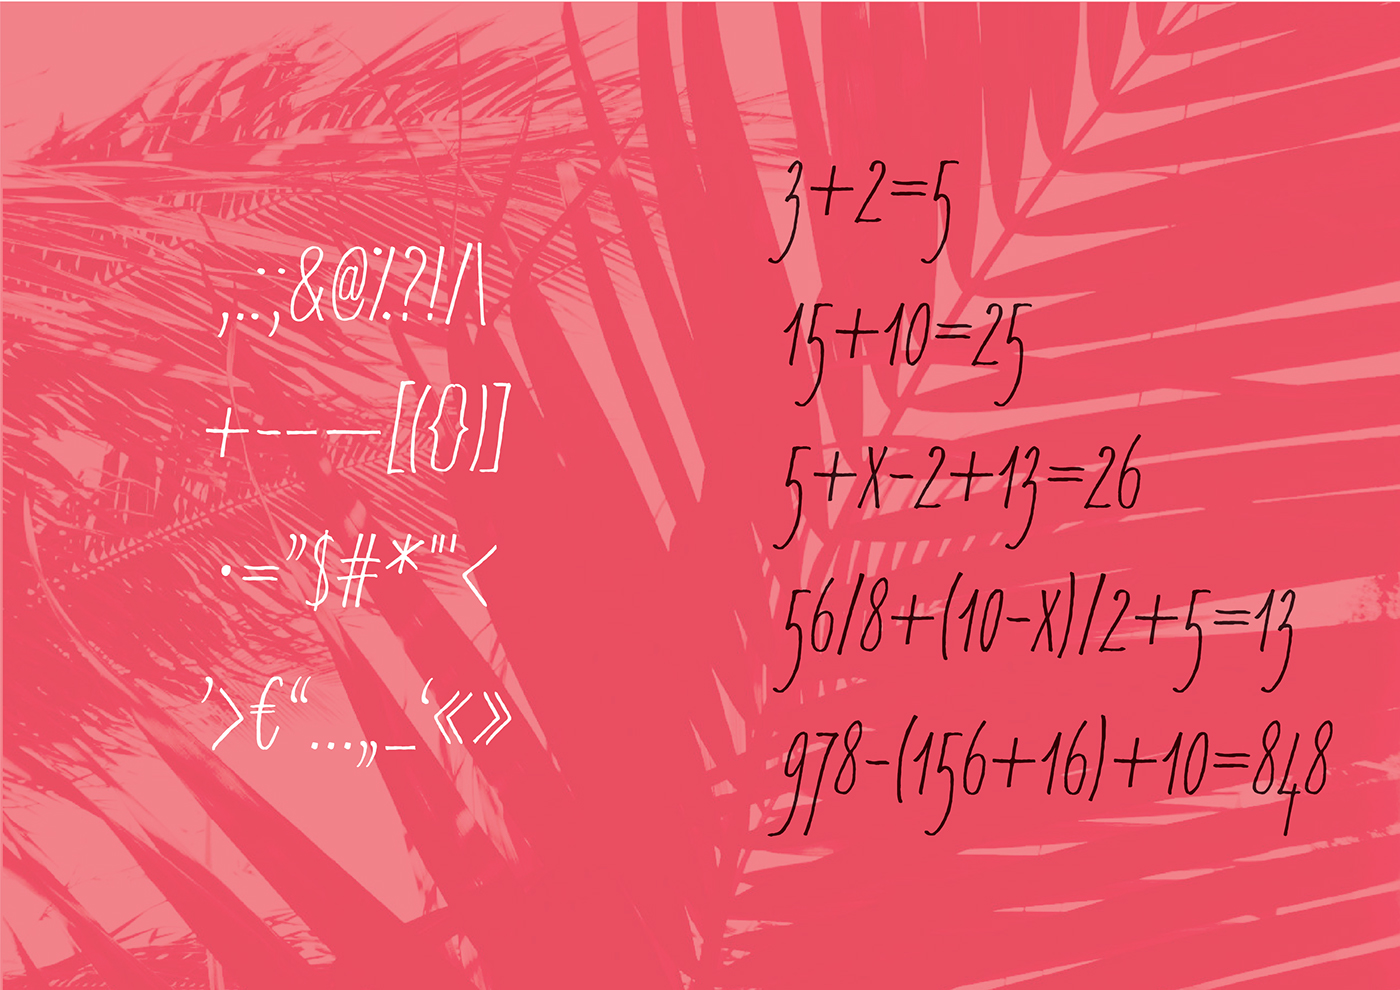 Jasminum Handwriting Font